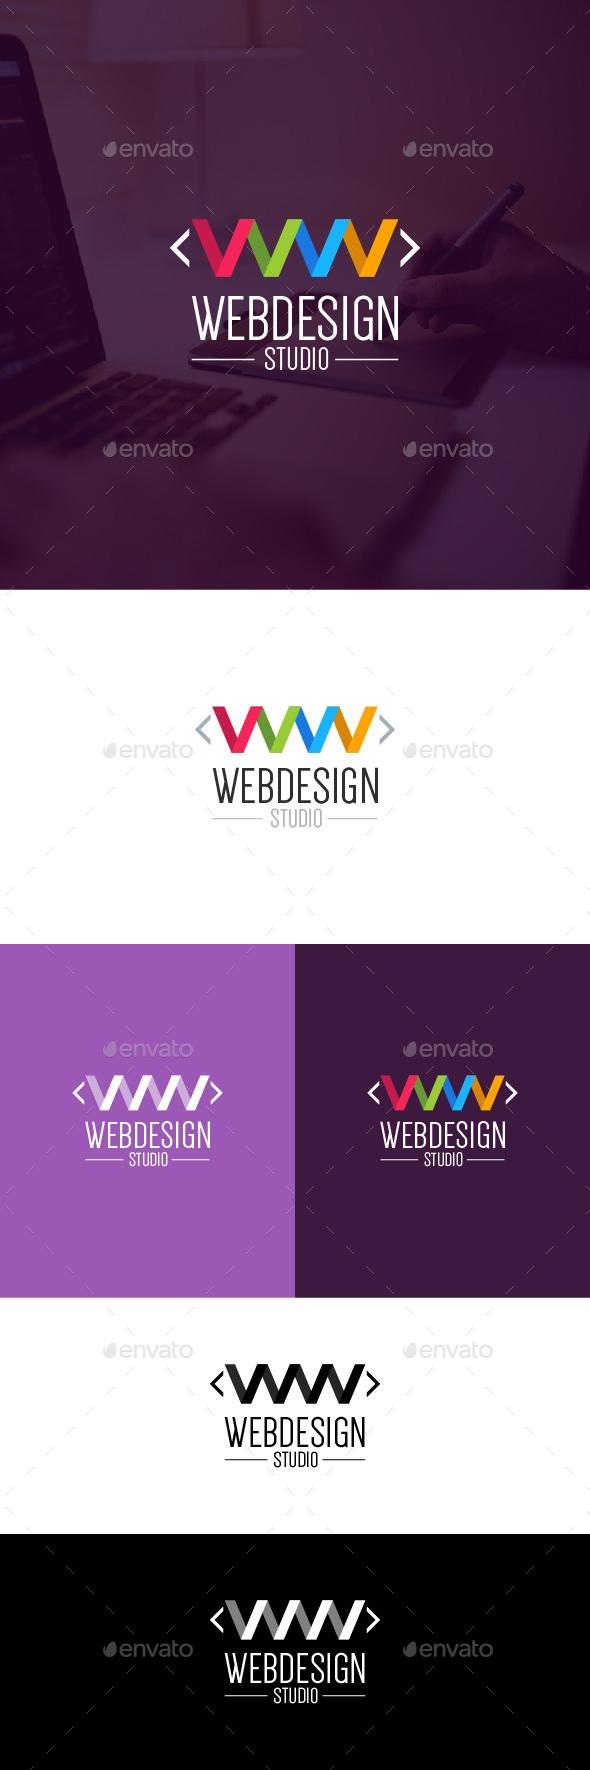 Web Design Studio Logo Template - Letters Logo Templates